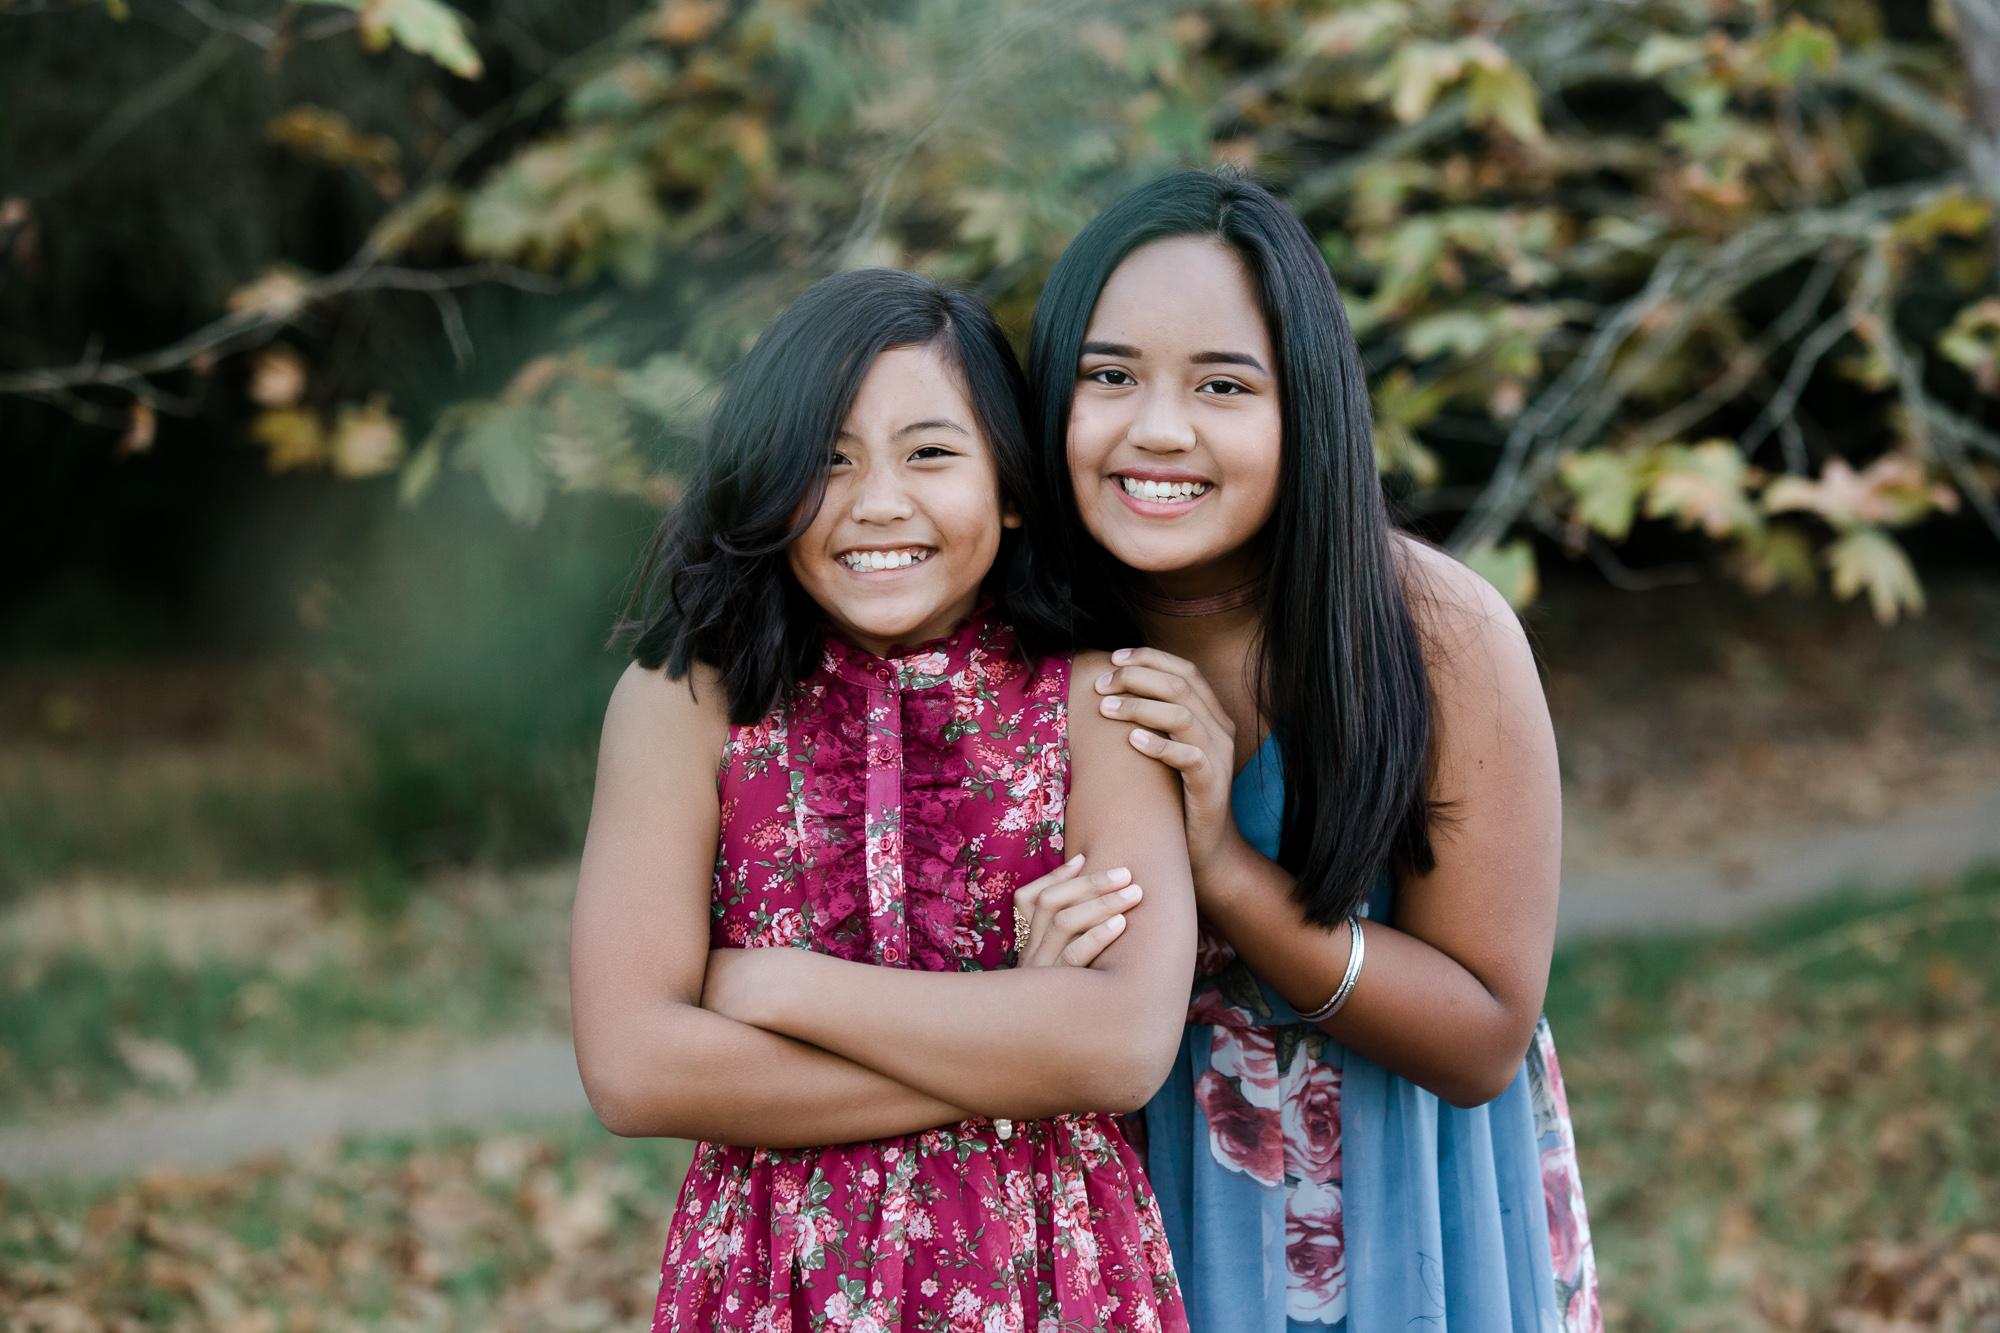 NEMA Photo R.Tabar2017030 - Tabar Family | Fall session | San Diego family photographer | Los penasquitos canyon preserve